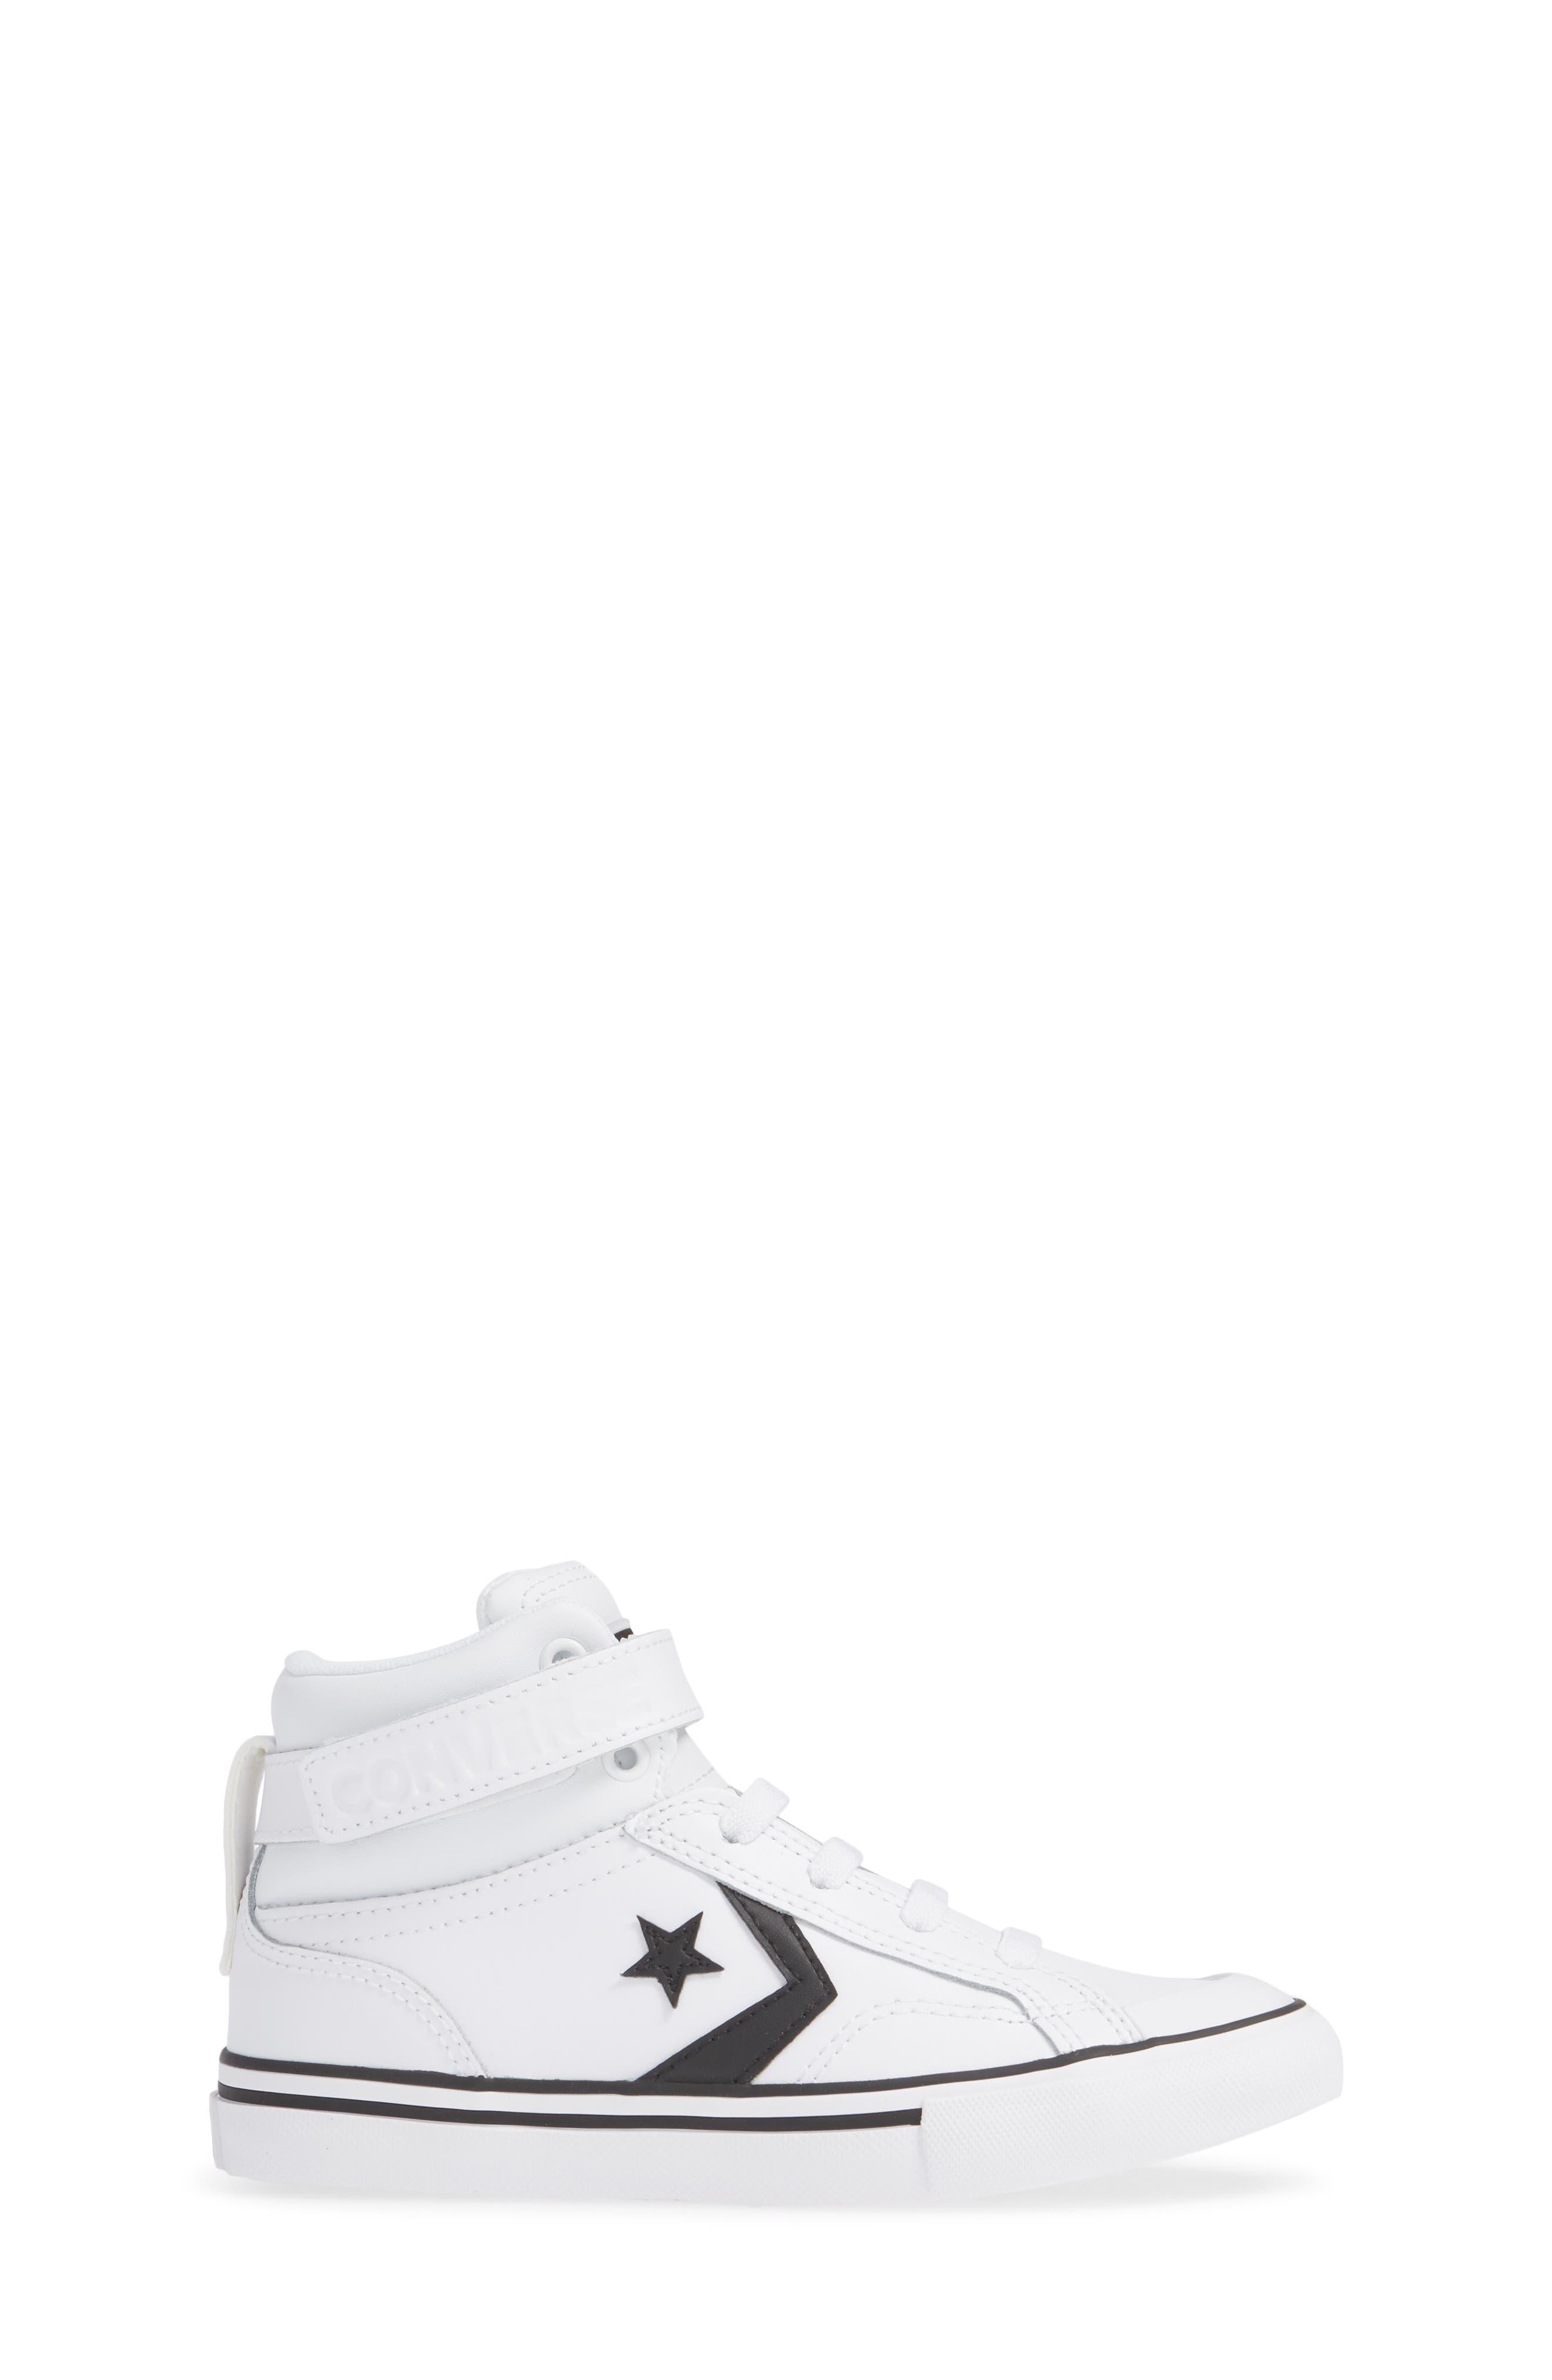 Pro Blaze High Top Sneaker,                             Alternate thumbnail 3, color,                             102